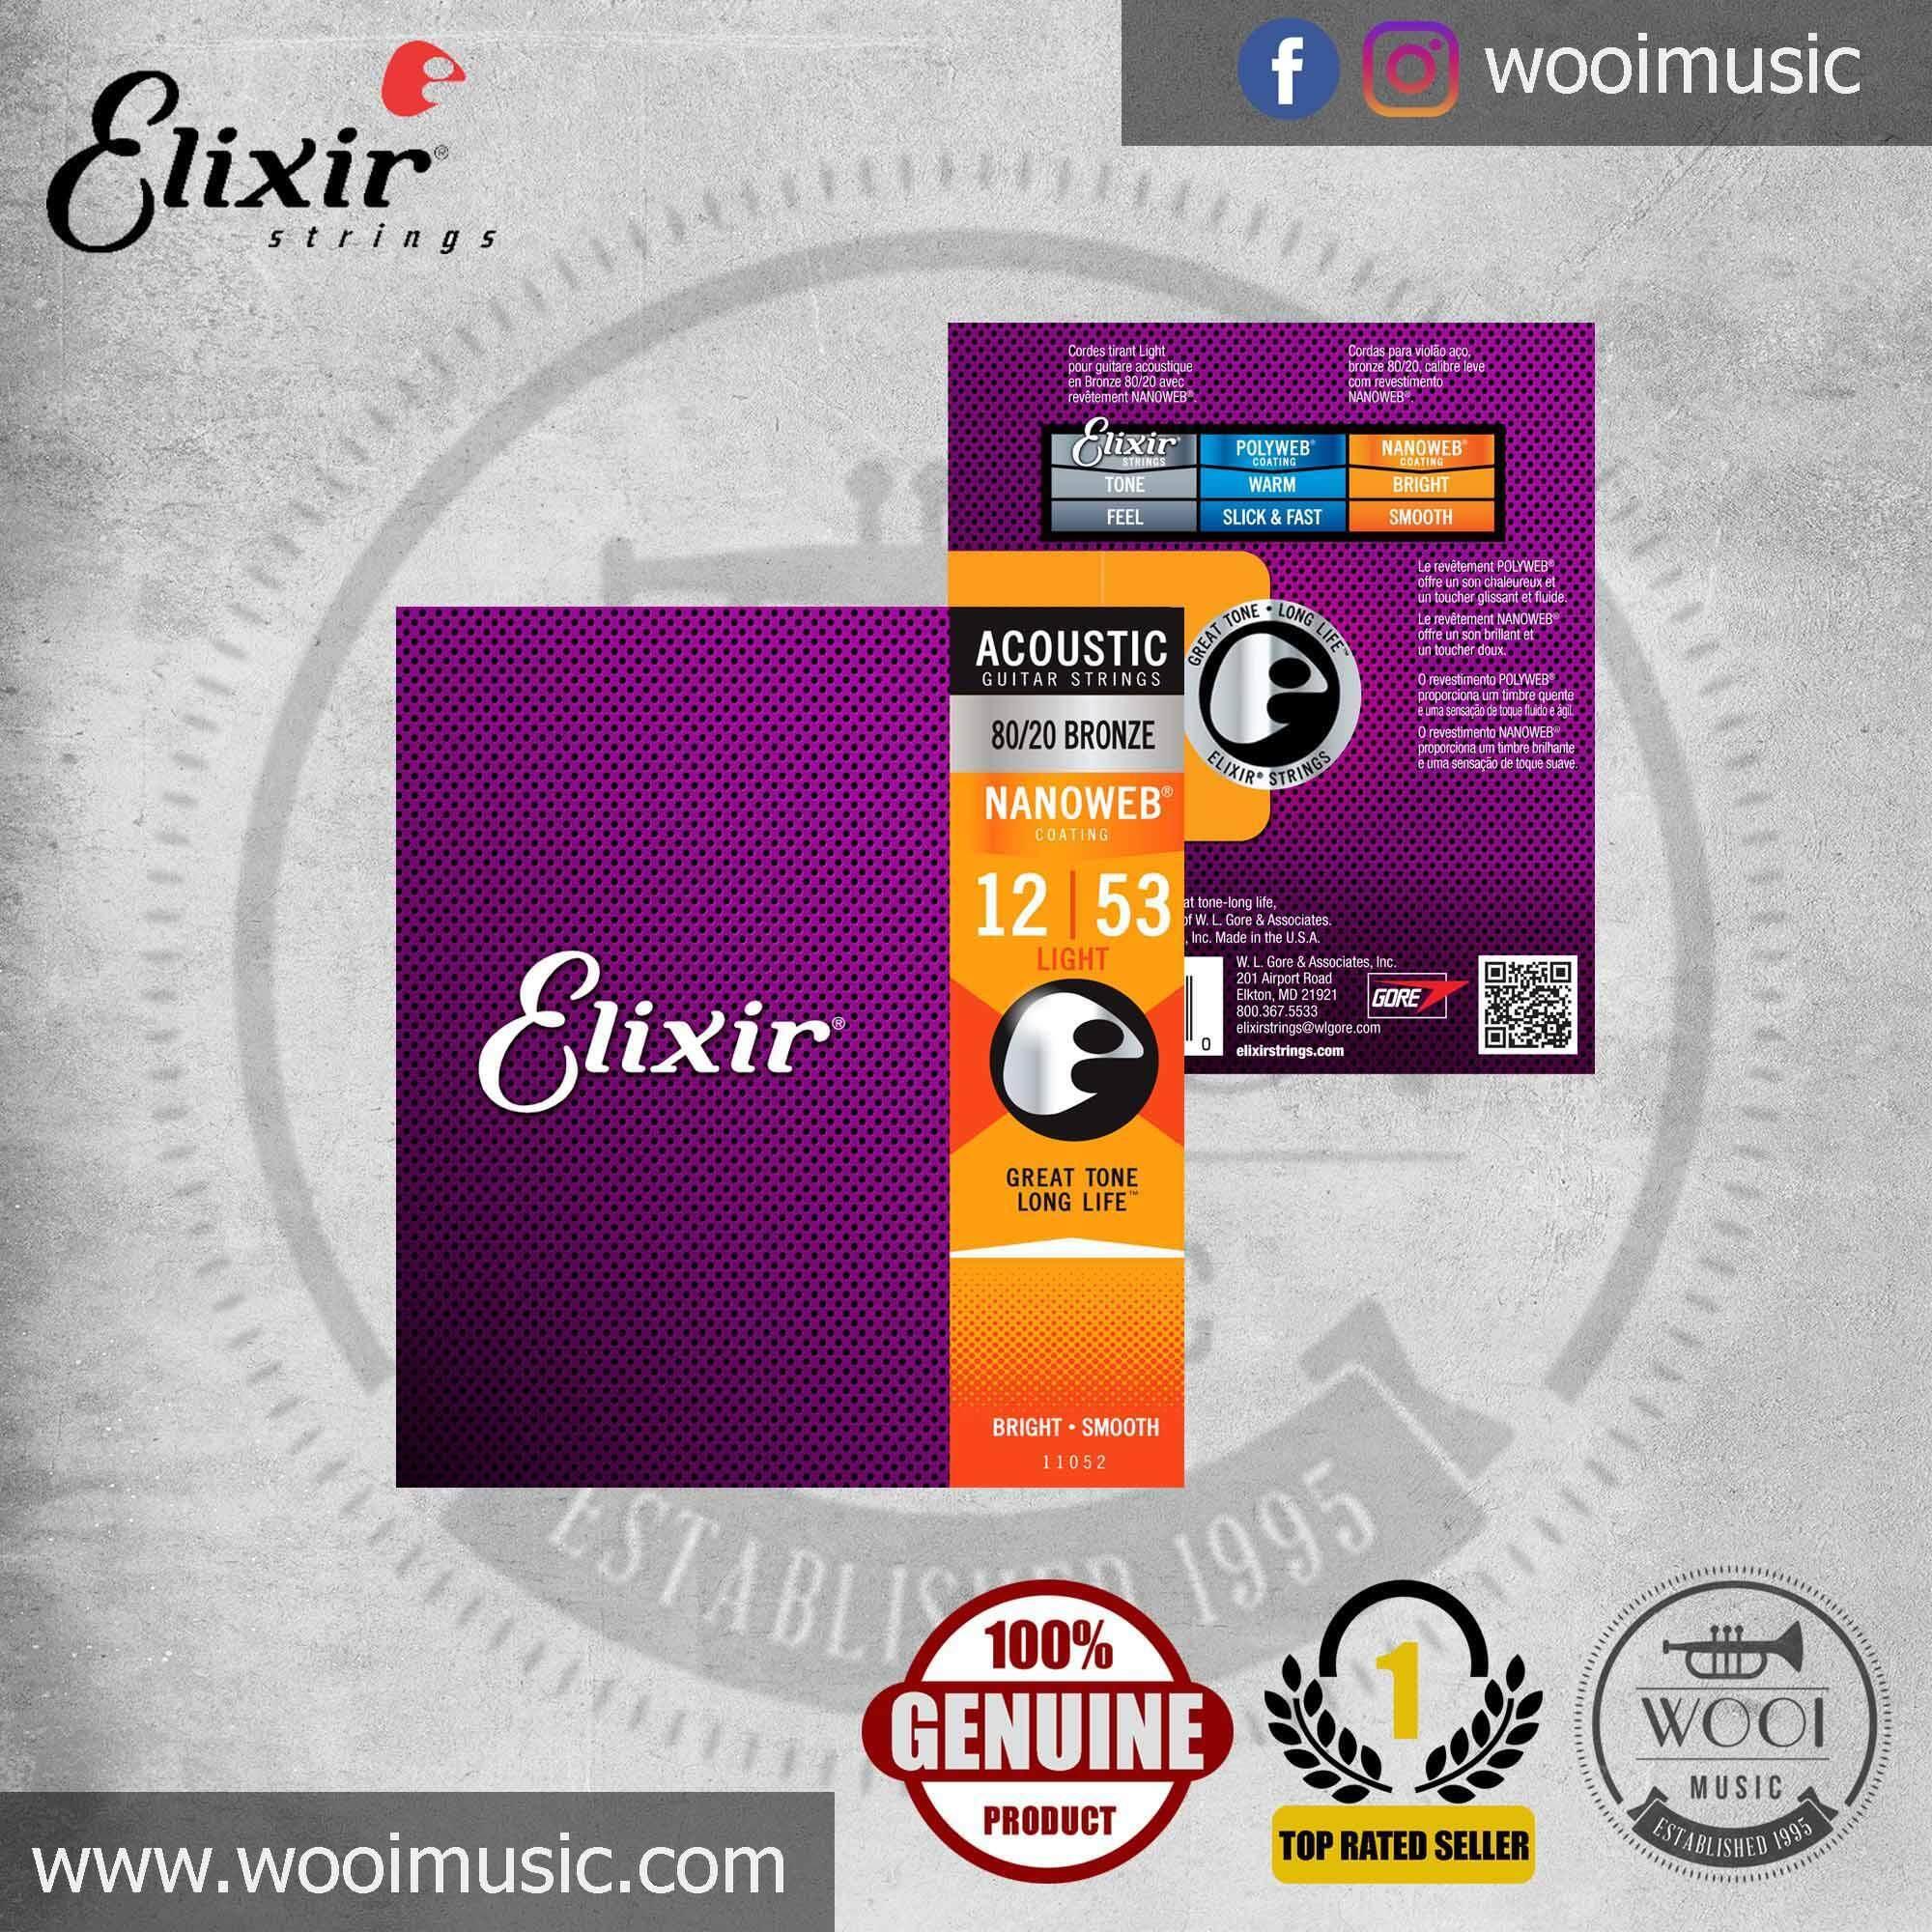 Elixir 11052 Acoustic Guitar Strings 80/20 Bronze Light with NANOWEB Coating (012-053)